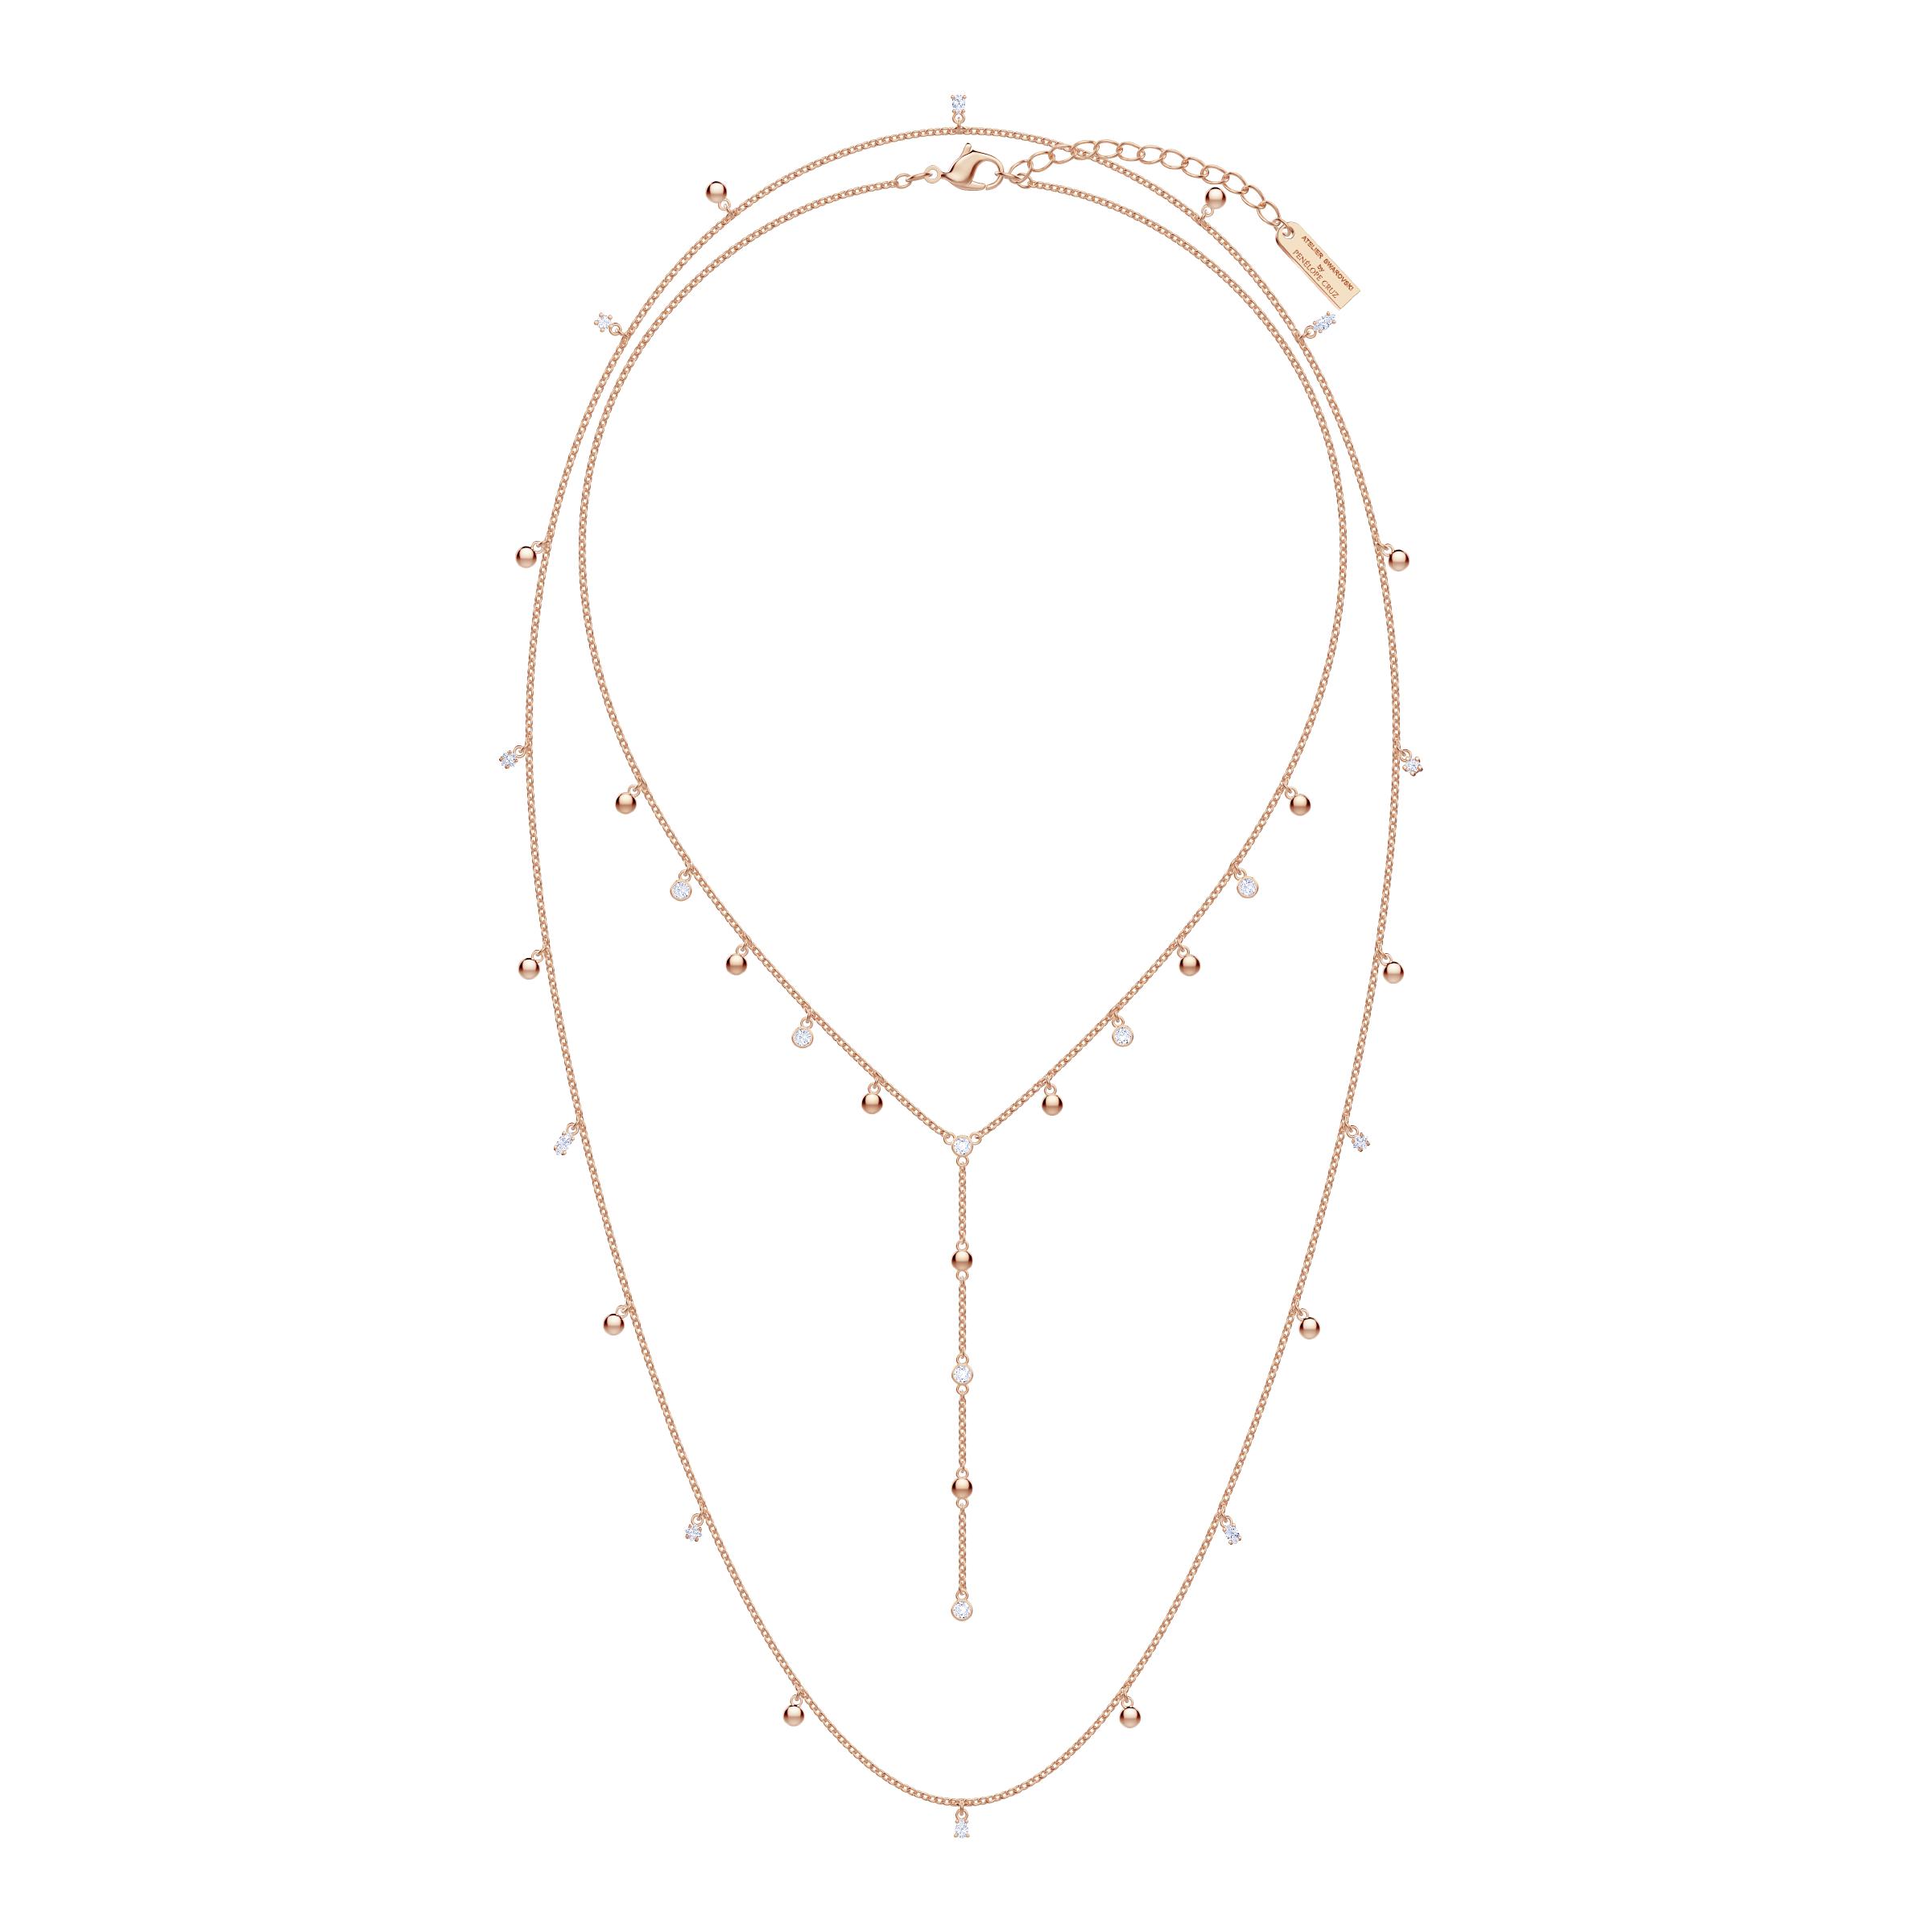 Penélope Cruz Moonsun Long Necklace, White, Rose gold plating